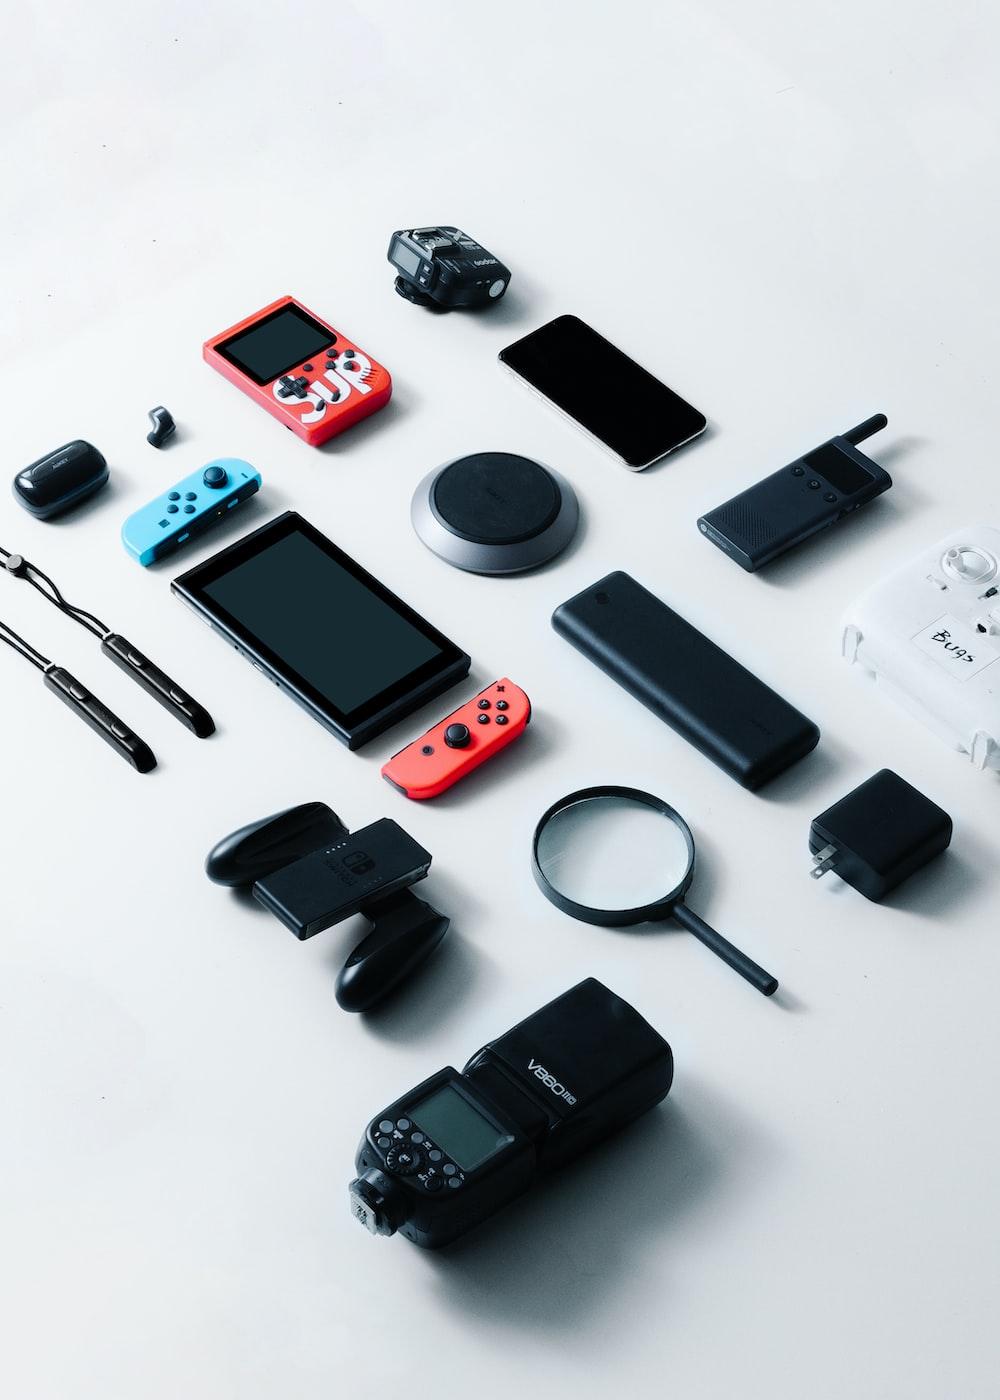 black and silver camera beside black smartphone and black smartphone